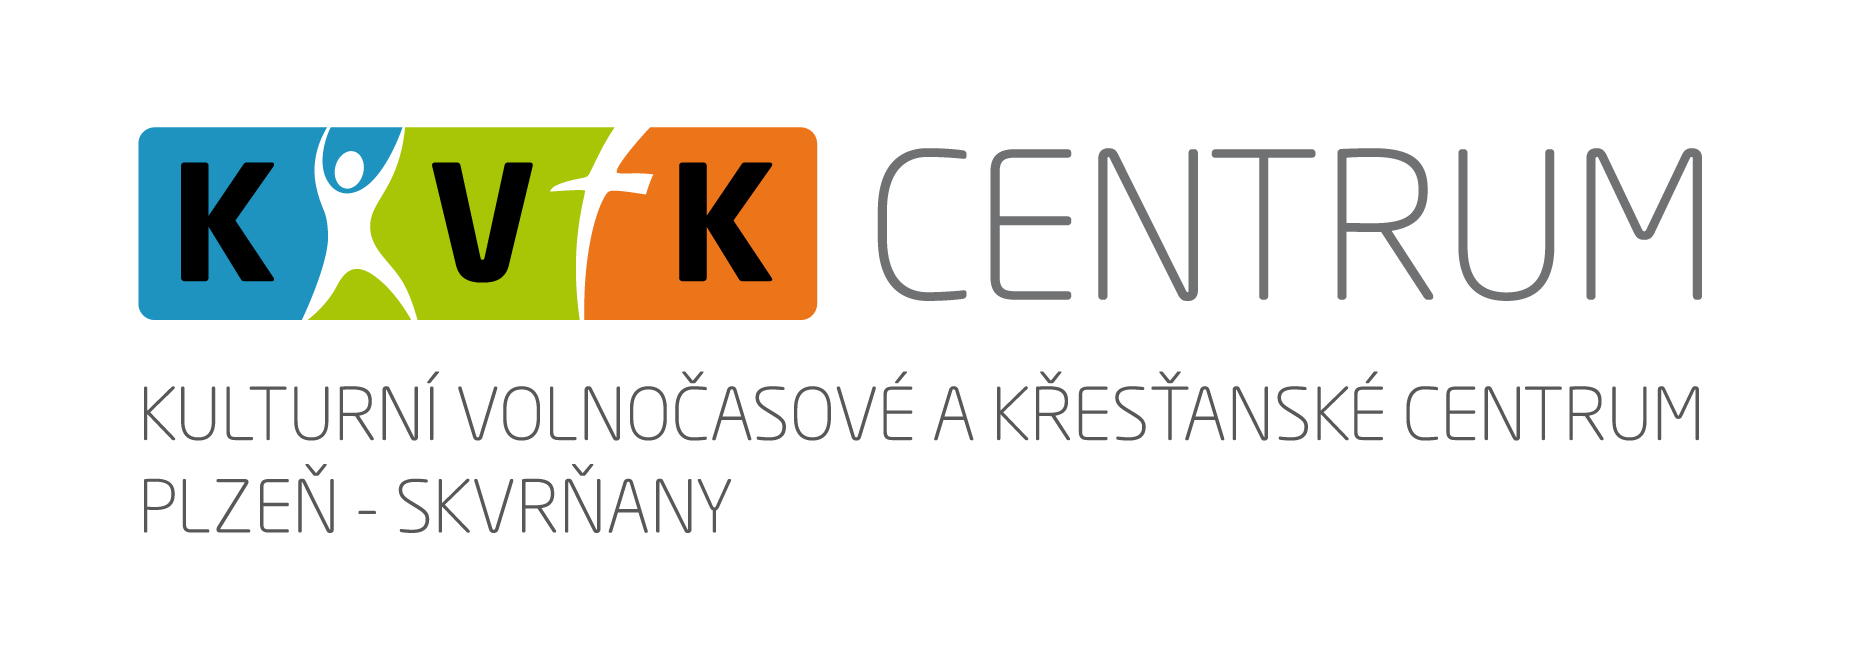 KVK Centrum